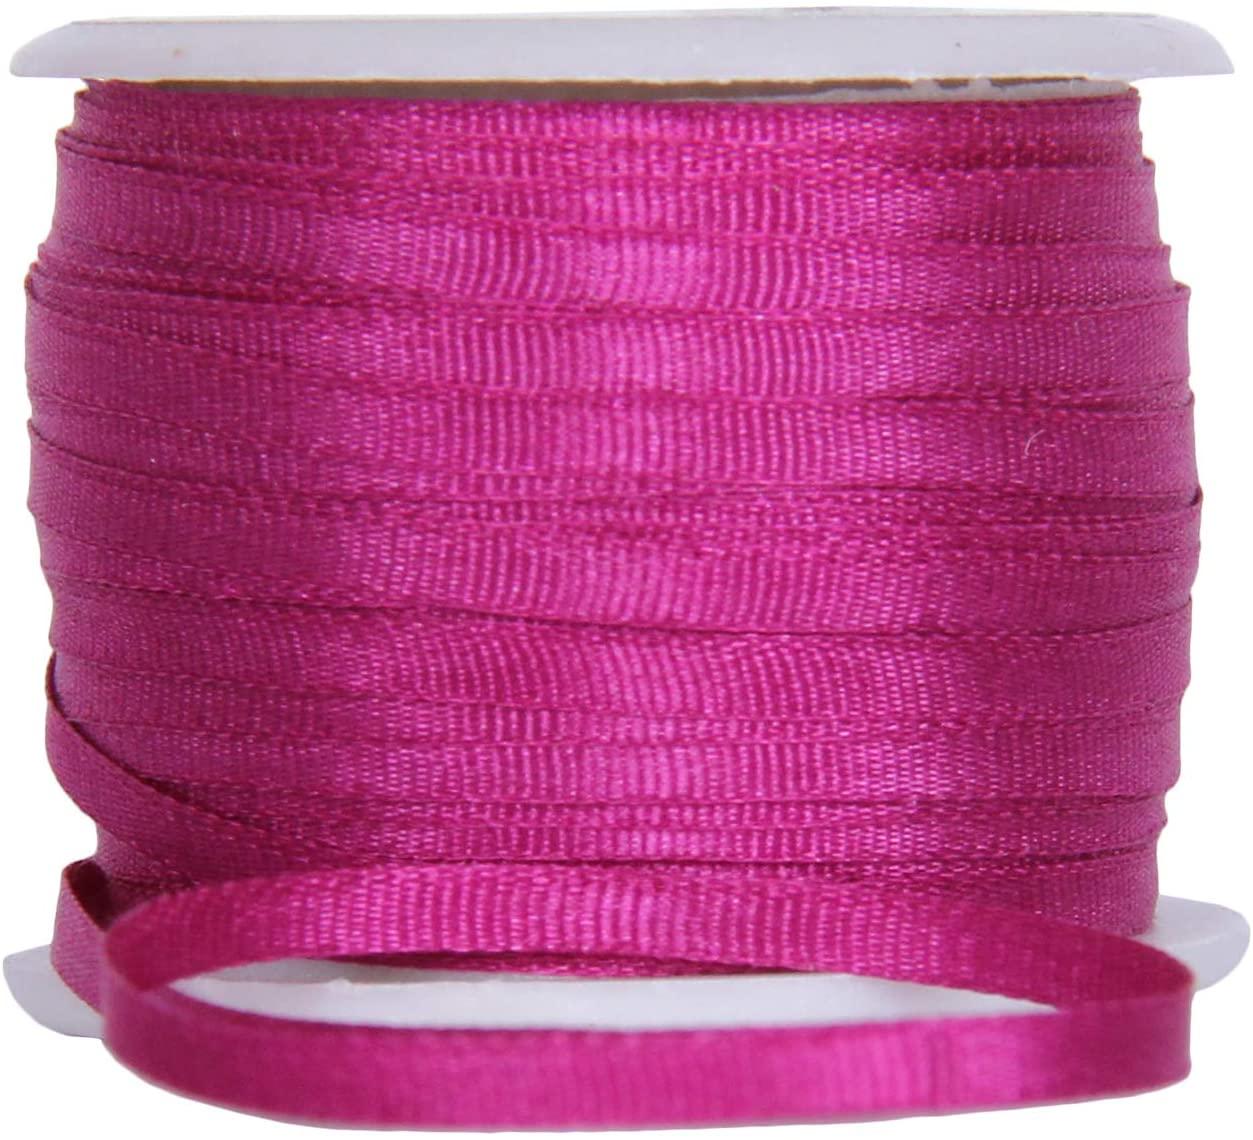 Threadart 100% Pure Silk Ribbon - 2mm Mulberry - No. 568-3 Sizes - 50 Colors